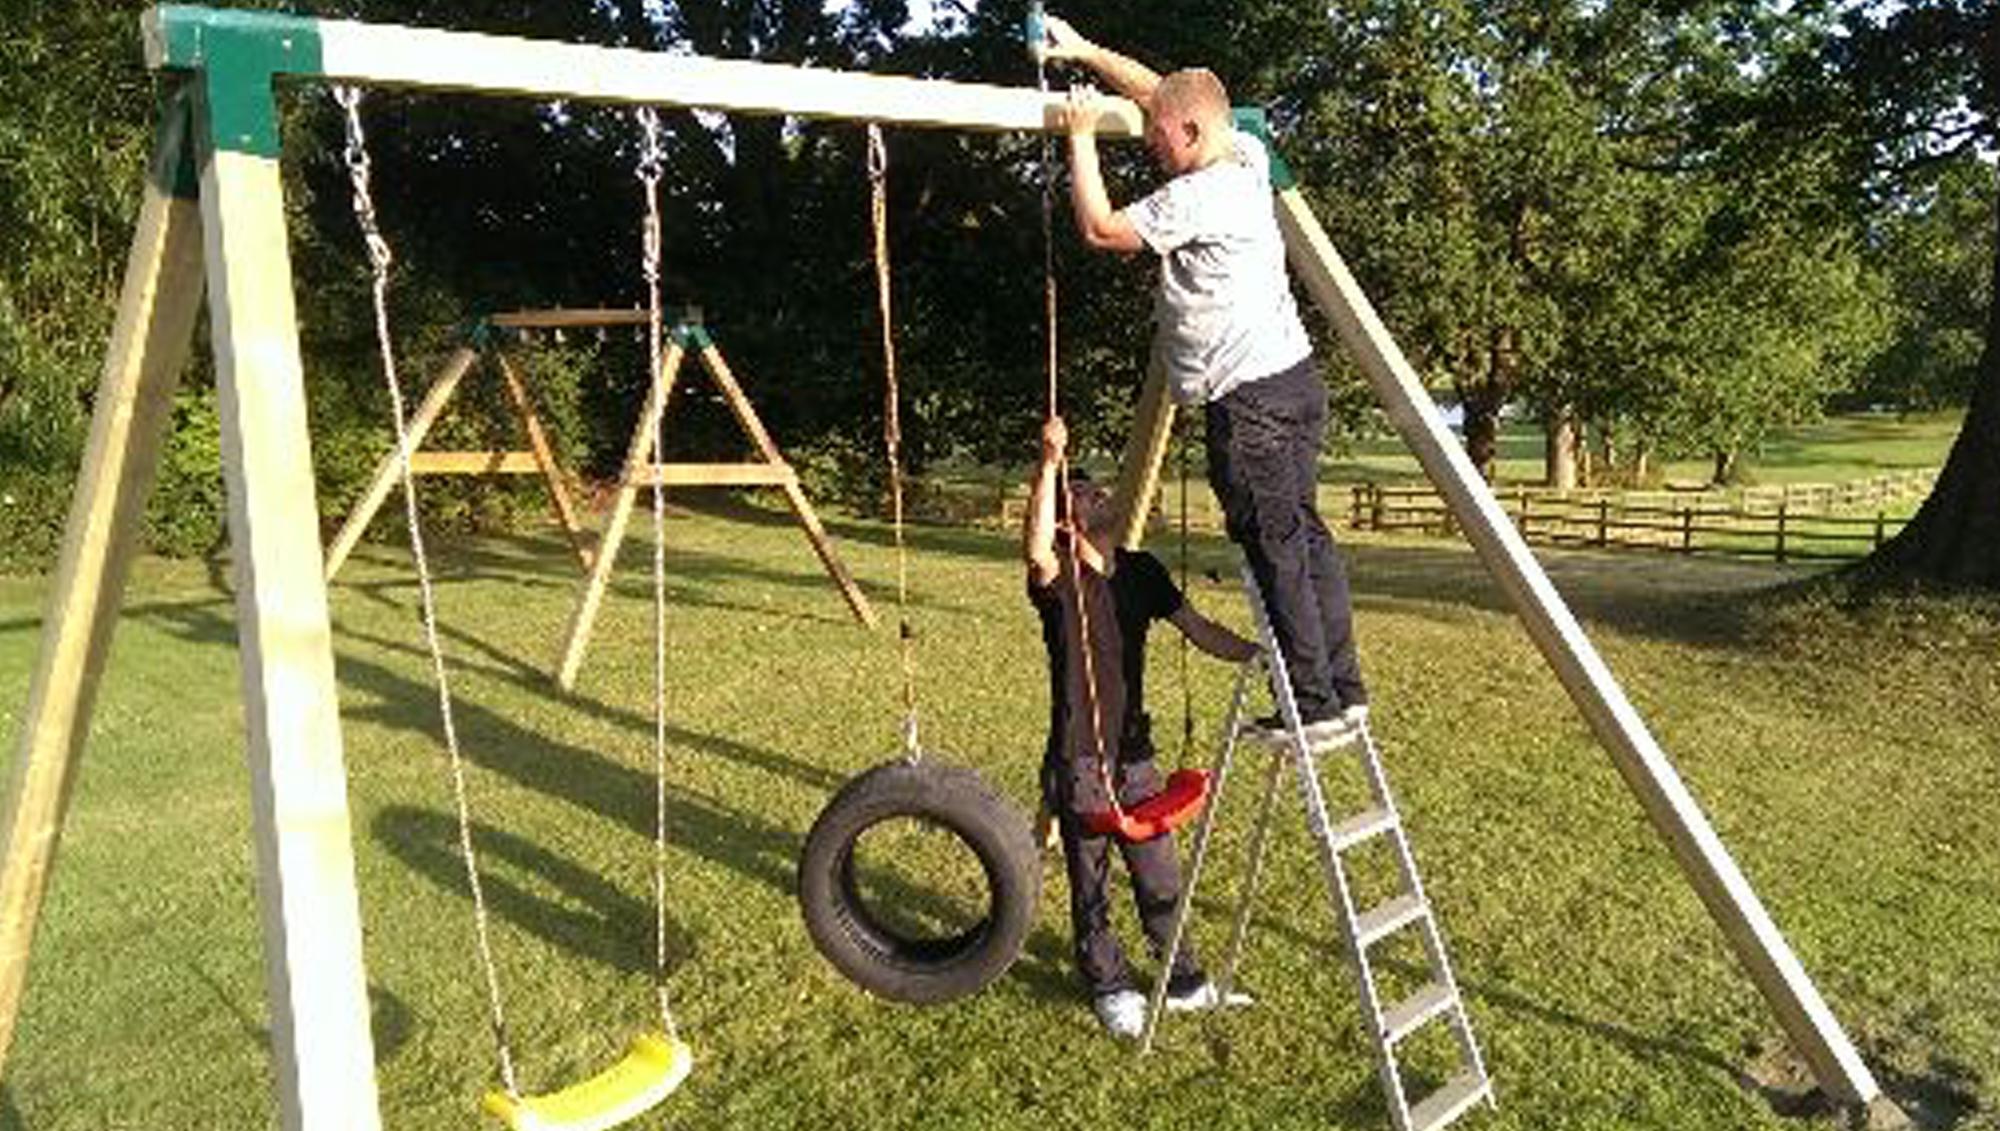 Installing a Play Crazy Climbing Frame